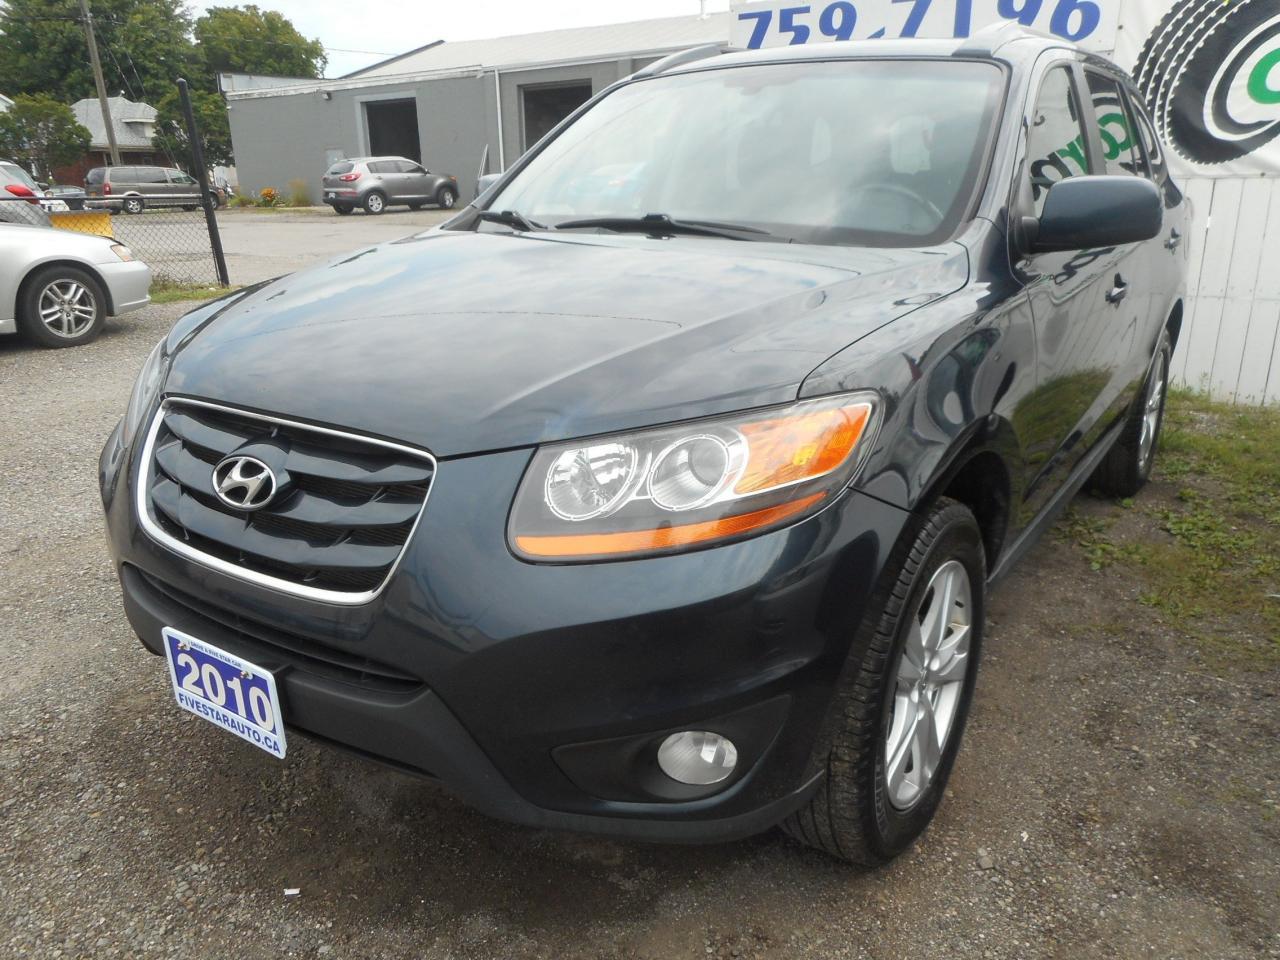 2010 Hyundai Santa Fe Certified w/ 6 Month Warranty